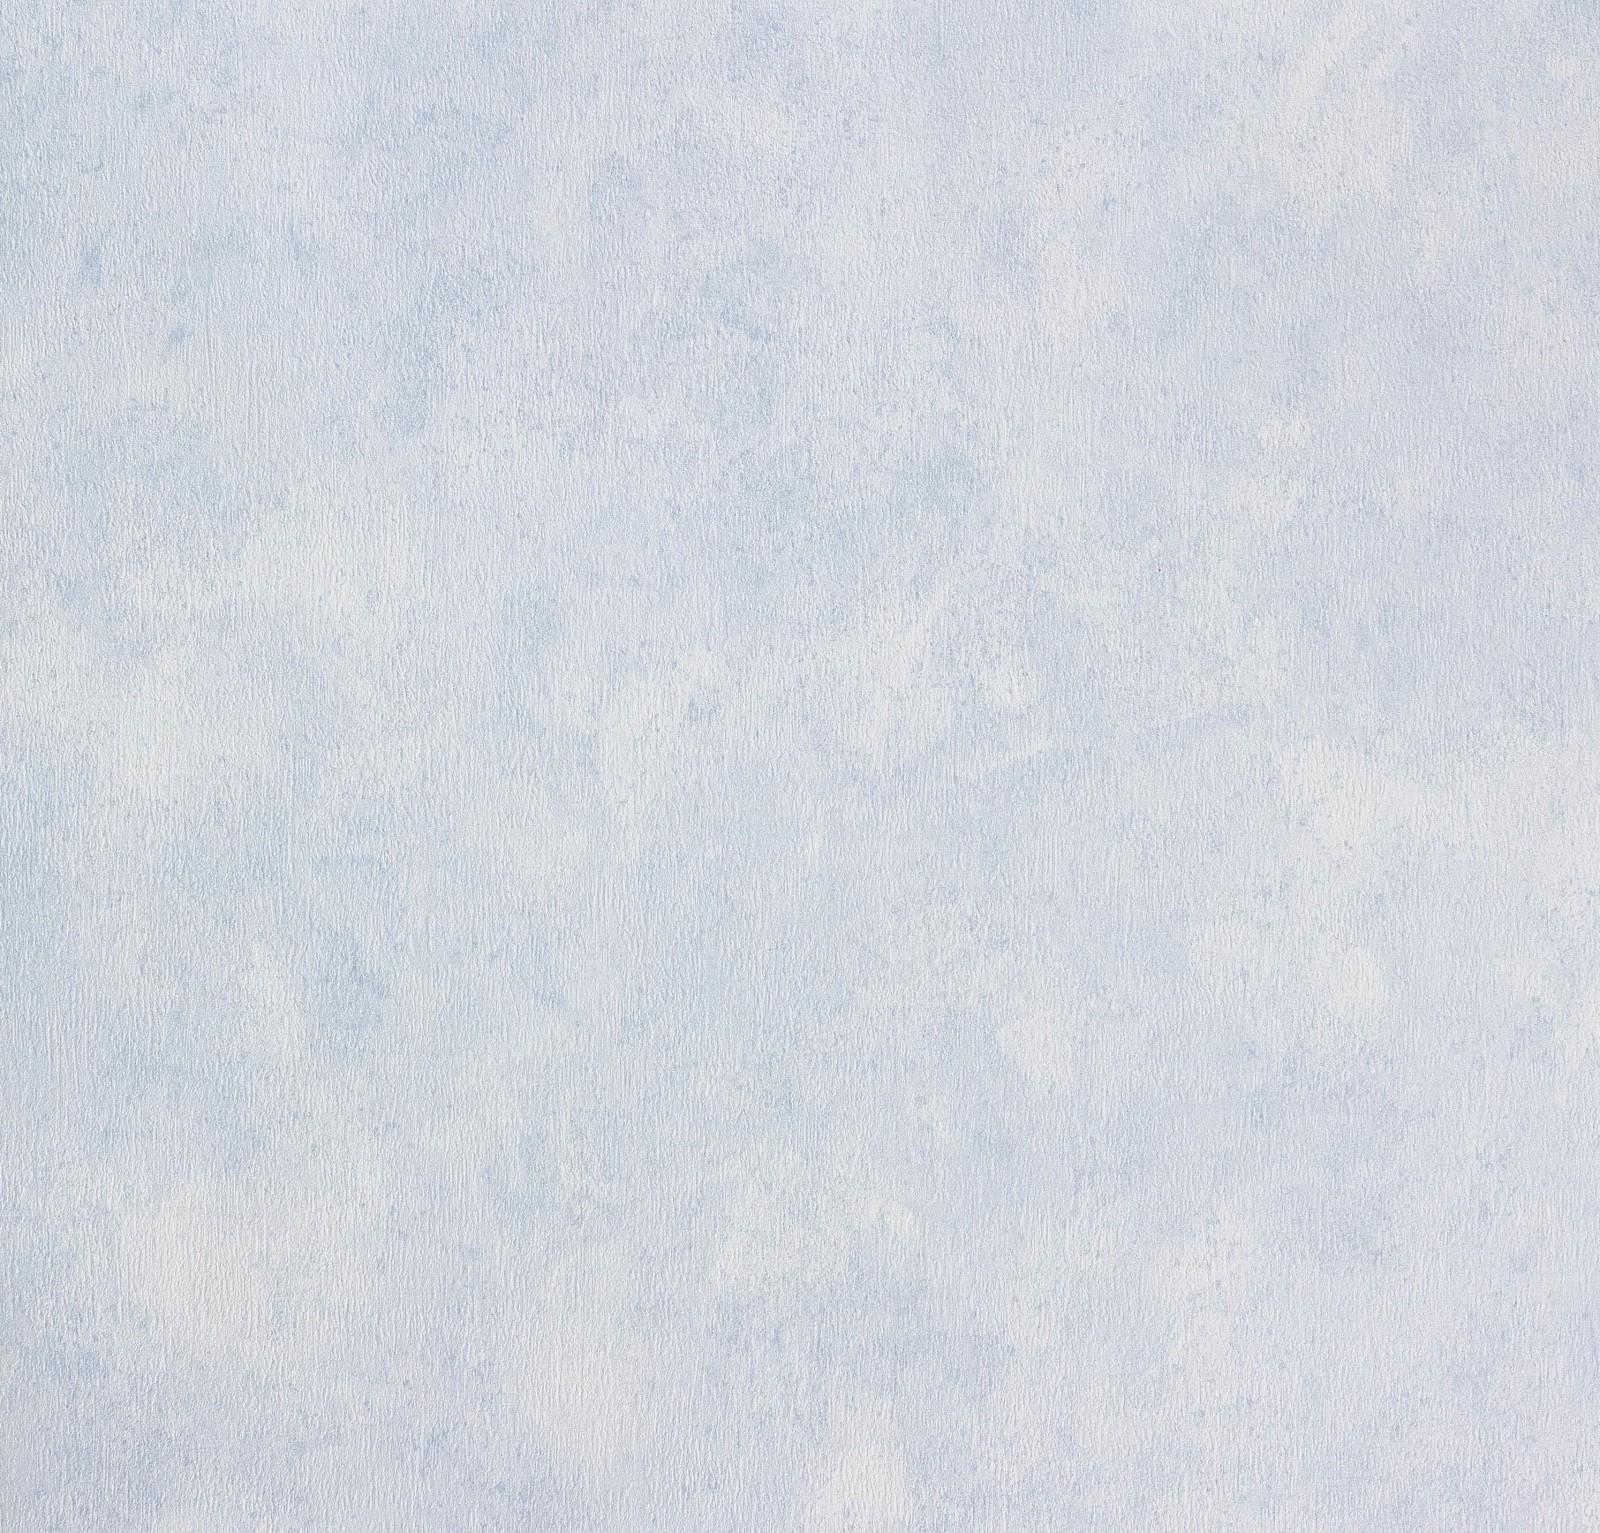 758781 Boys /& Girls Plain Grained Light Blue AS Creation Wallpaper